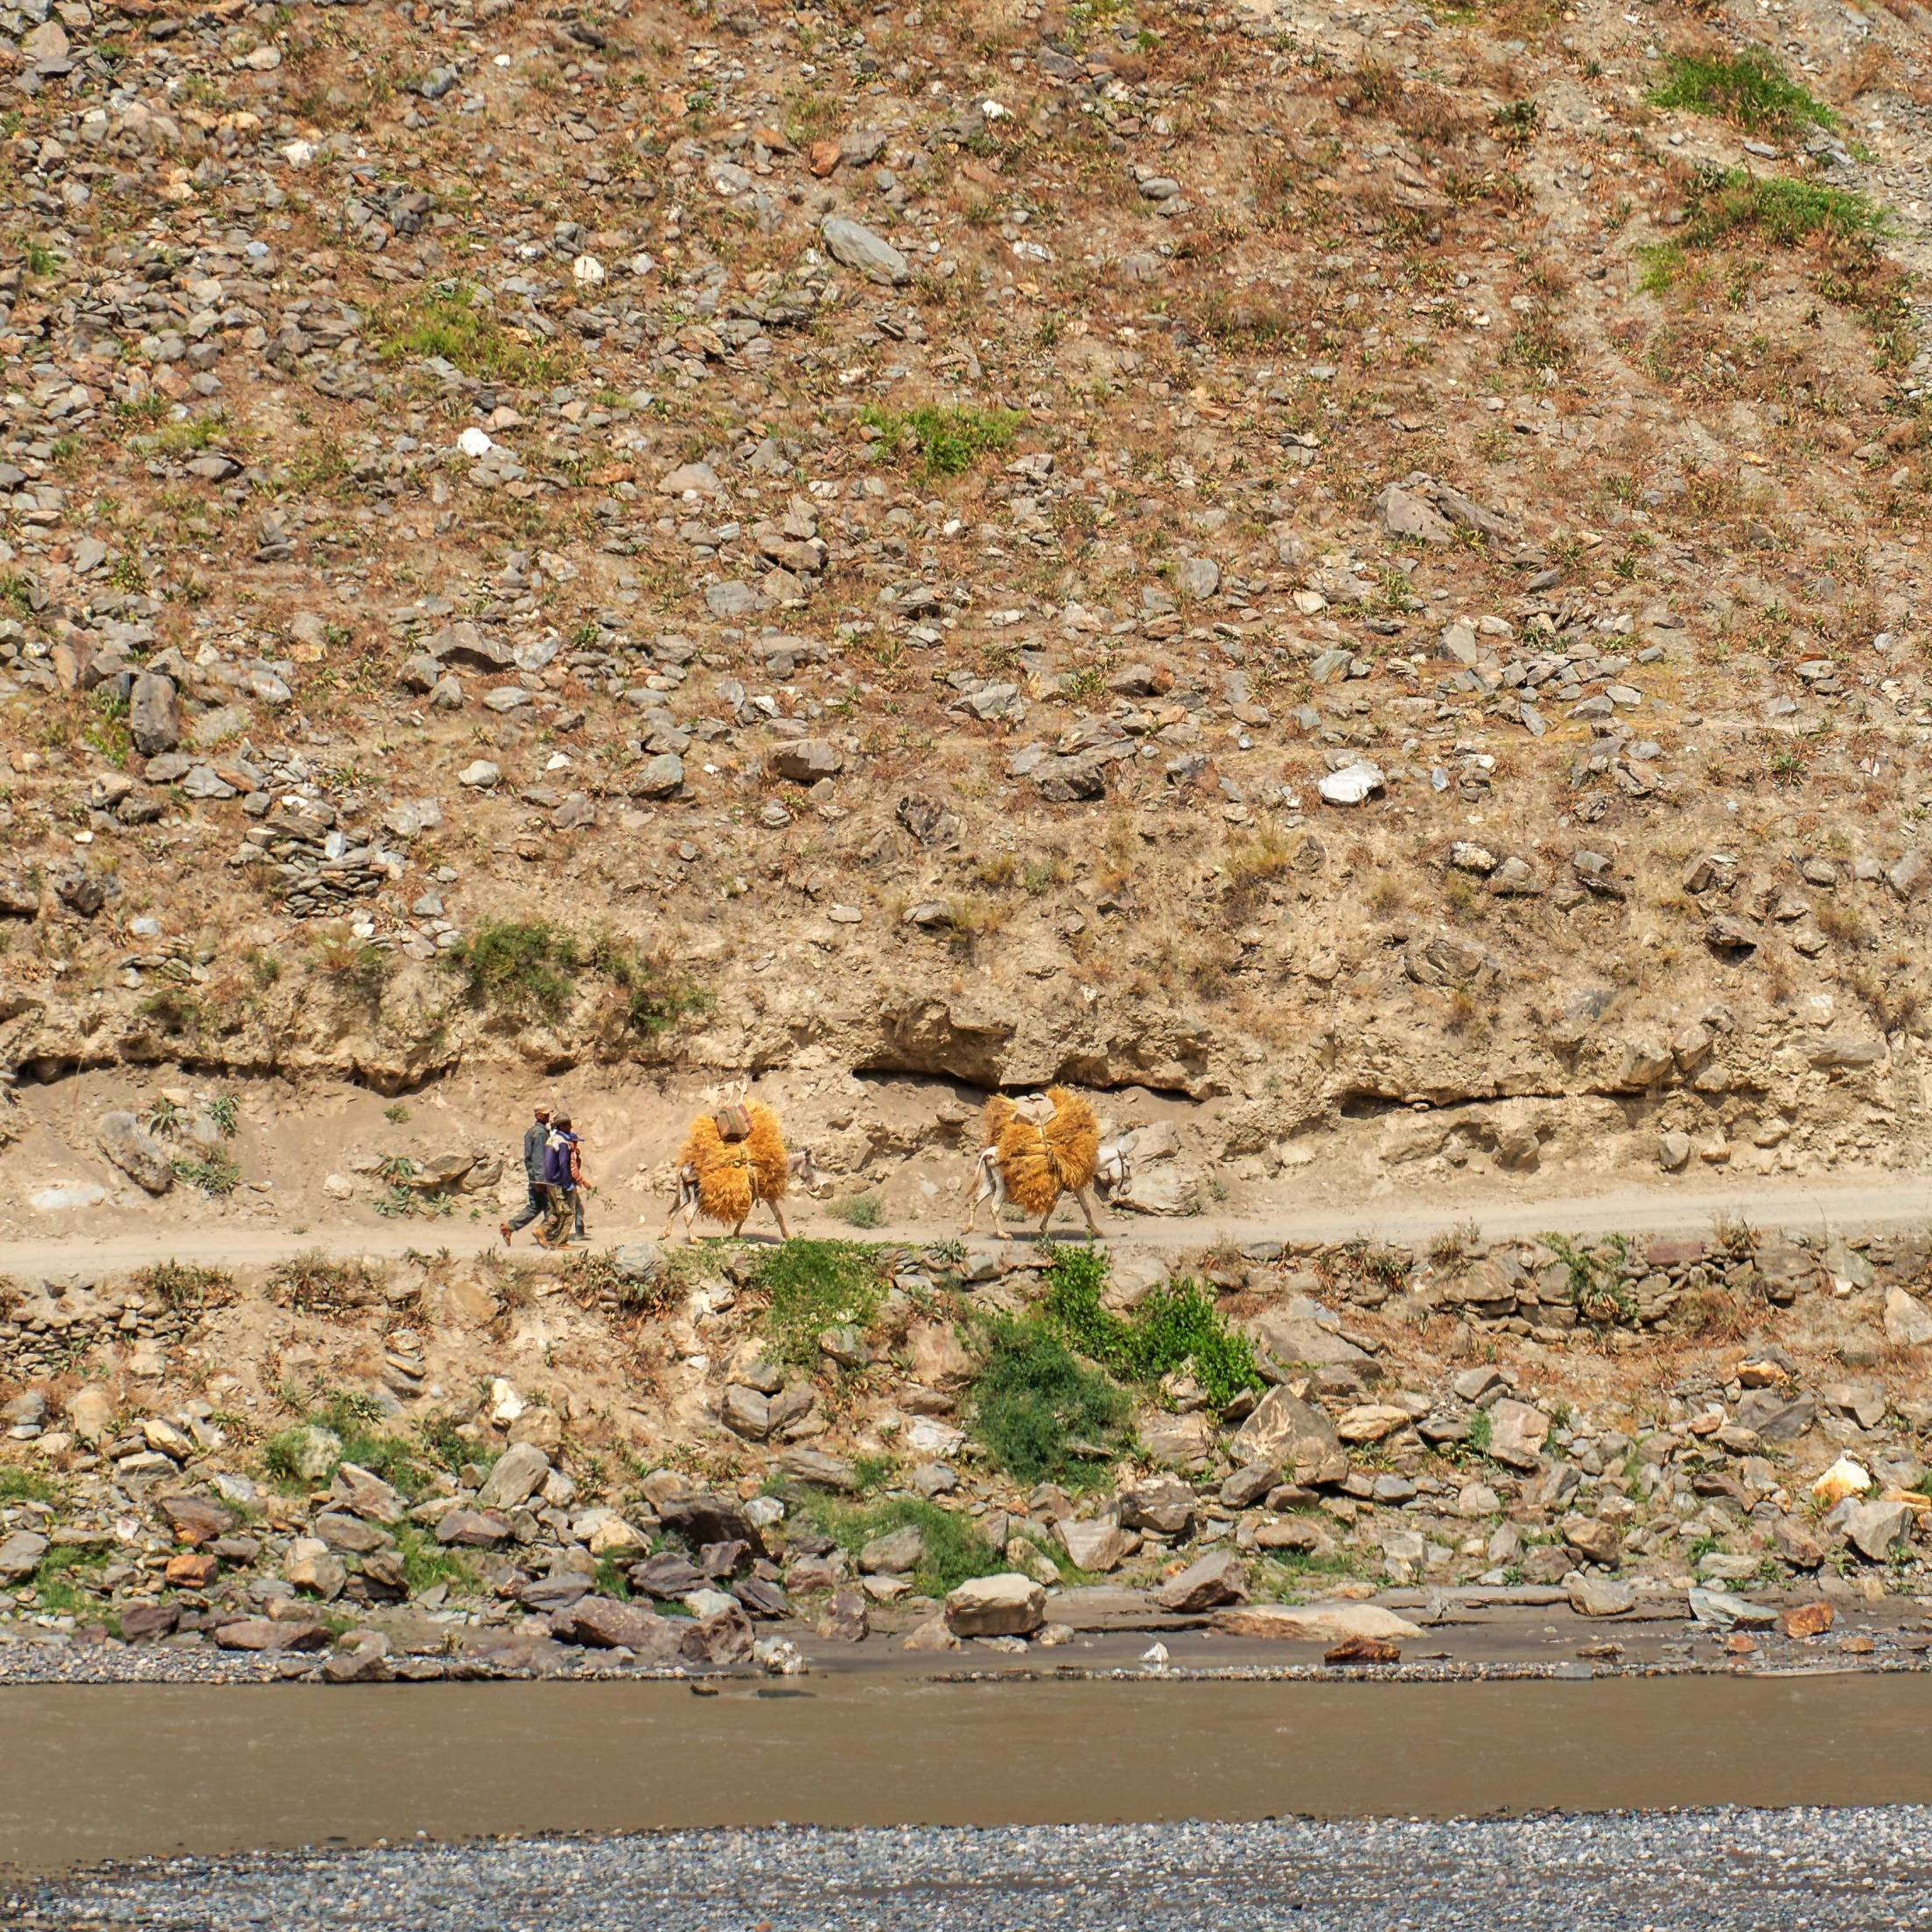 Afghans transporting hay